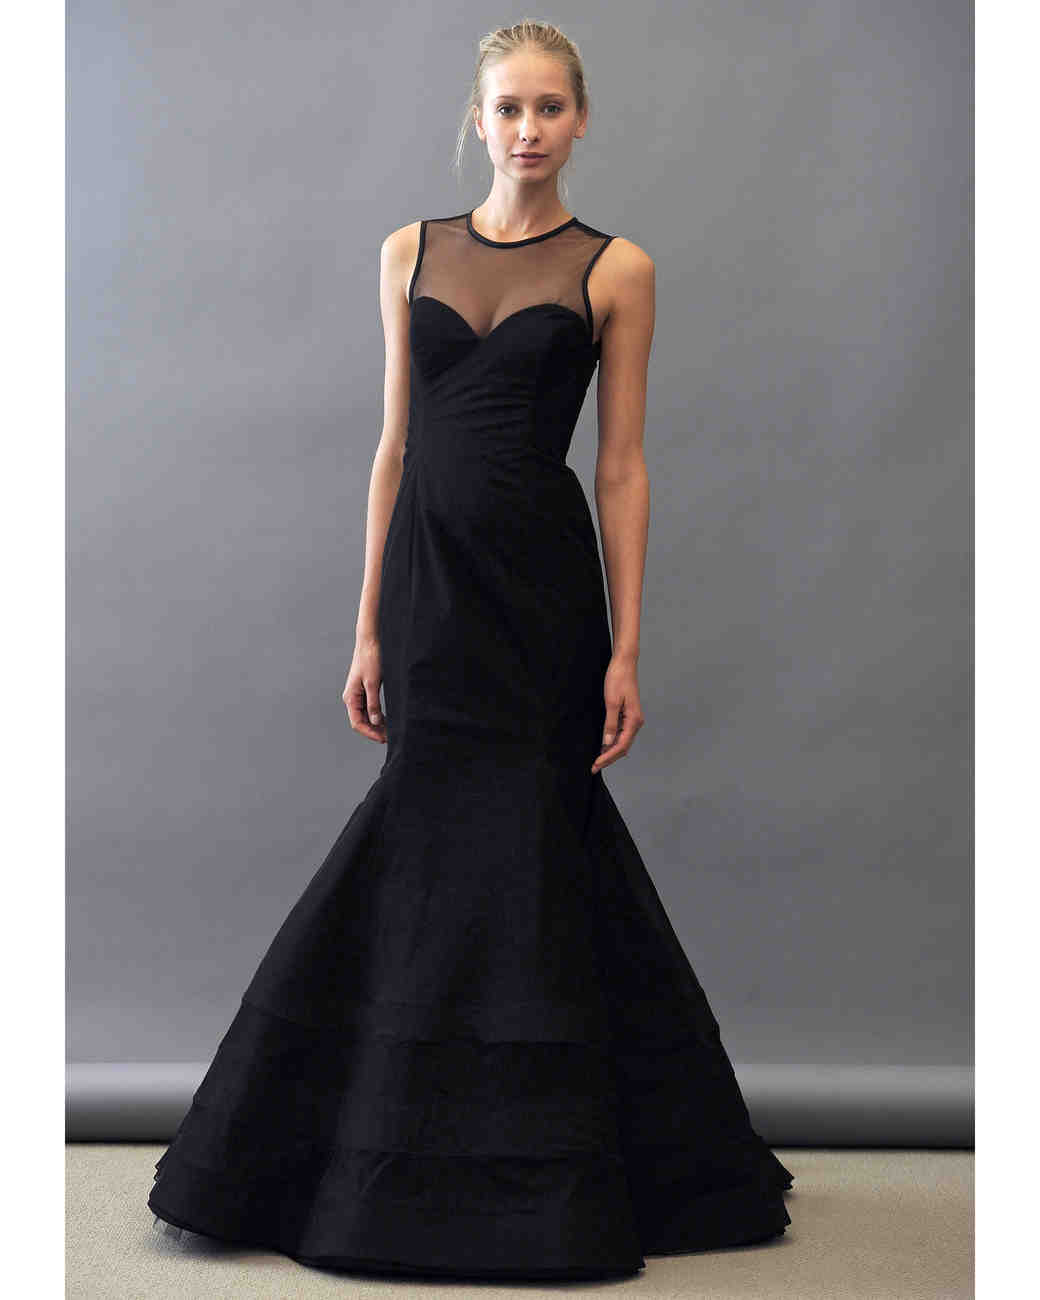 Noir by lazaro spring 2013 bridesmaid collection martha stewart trumpet bridesmaid dress in black noir by lazaro ombrellifo Choice Image